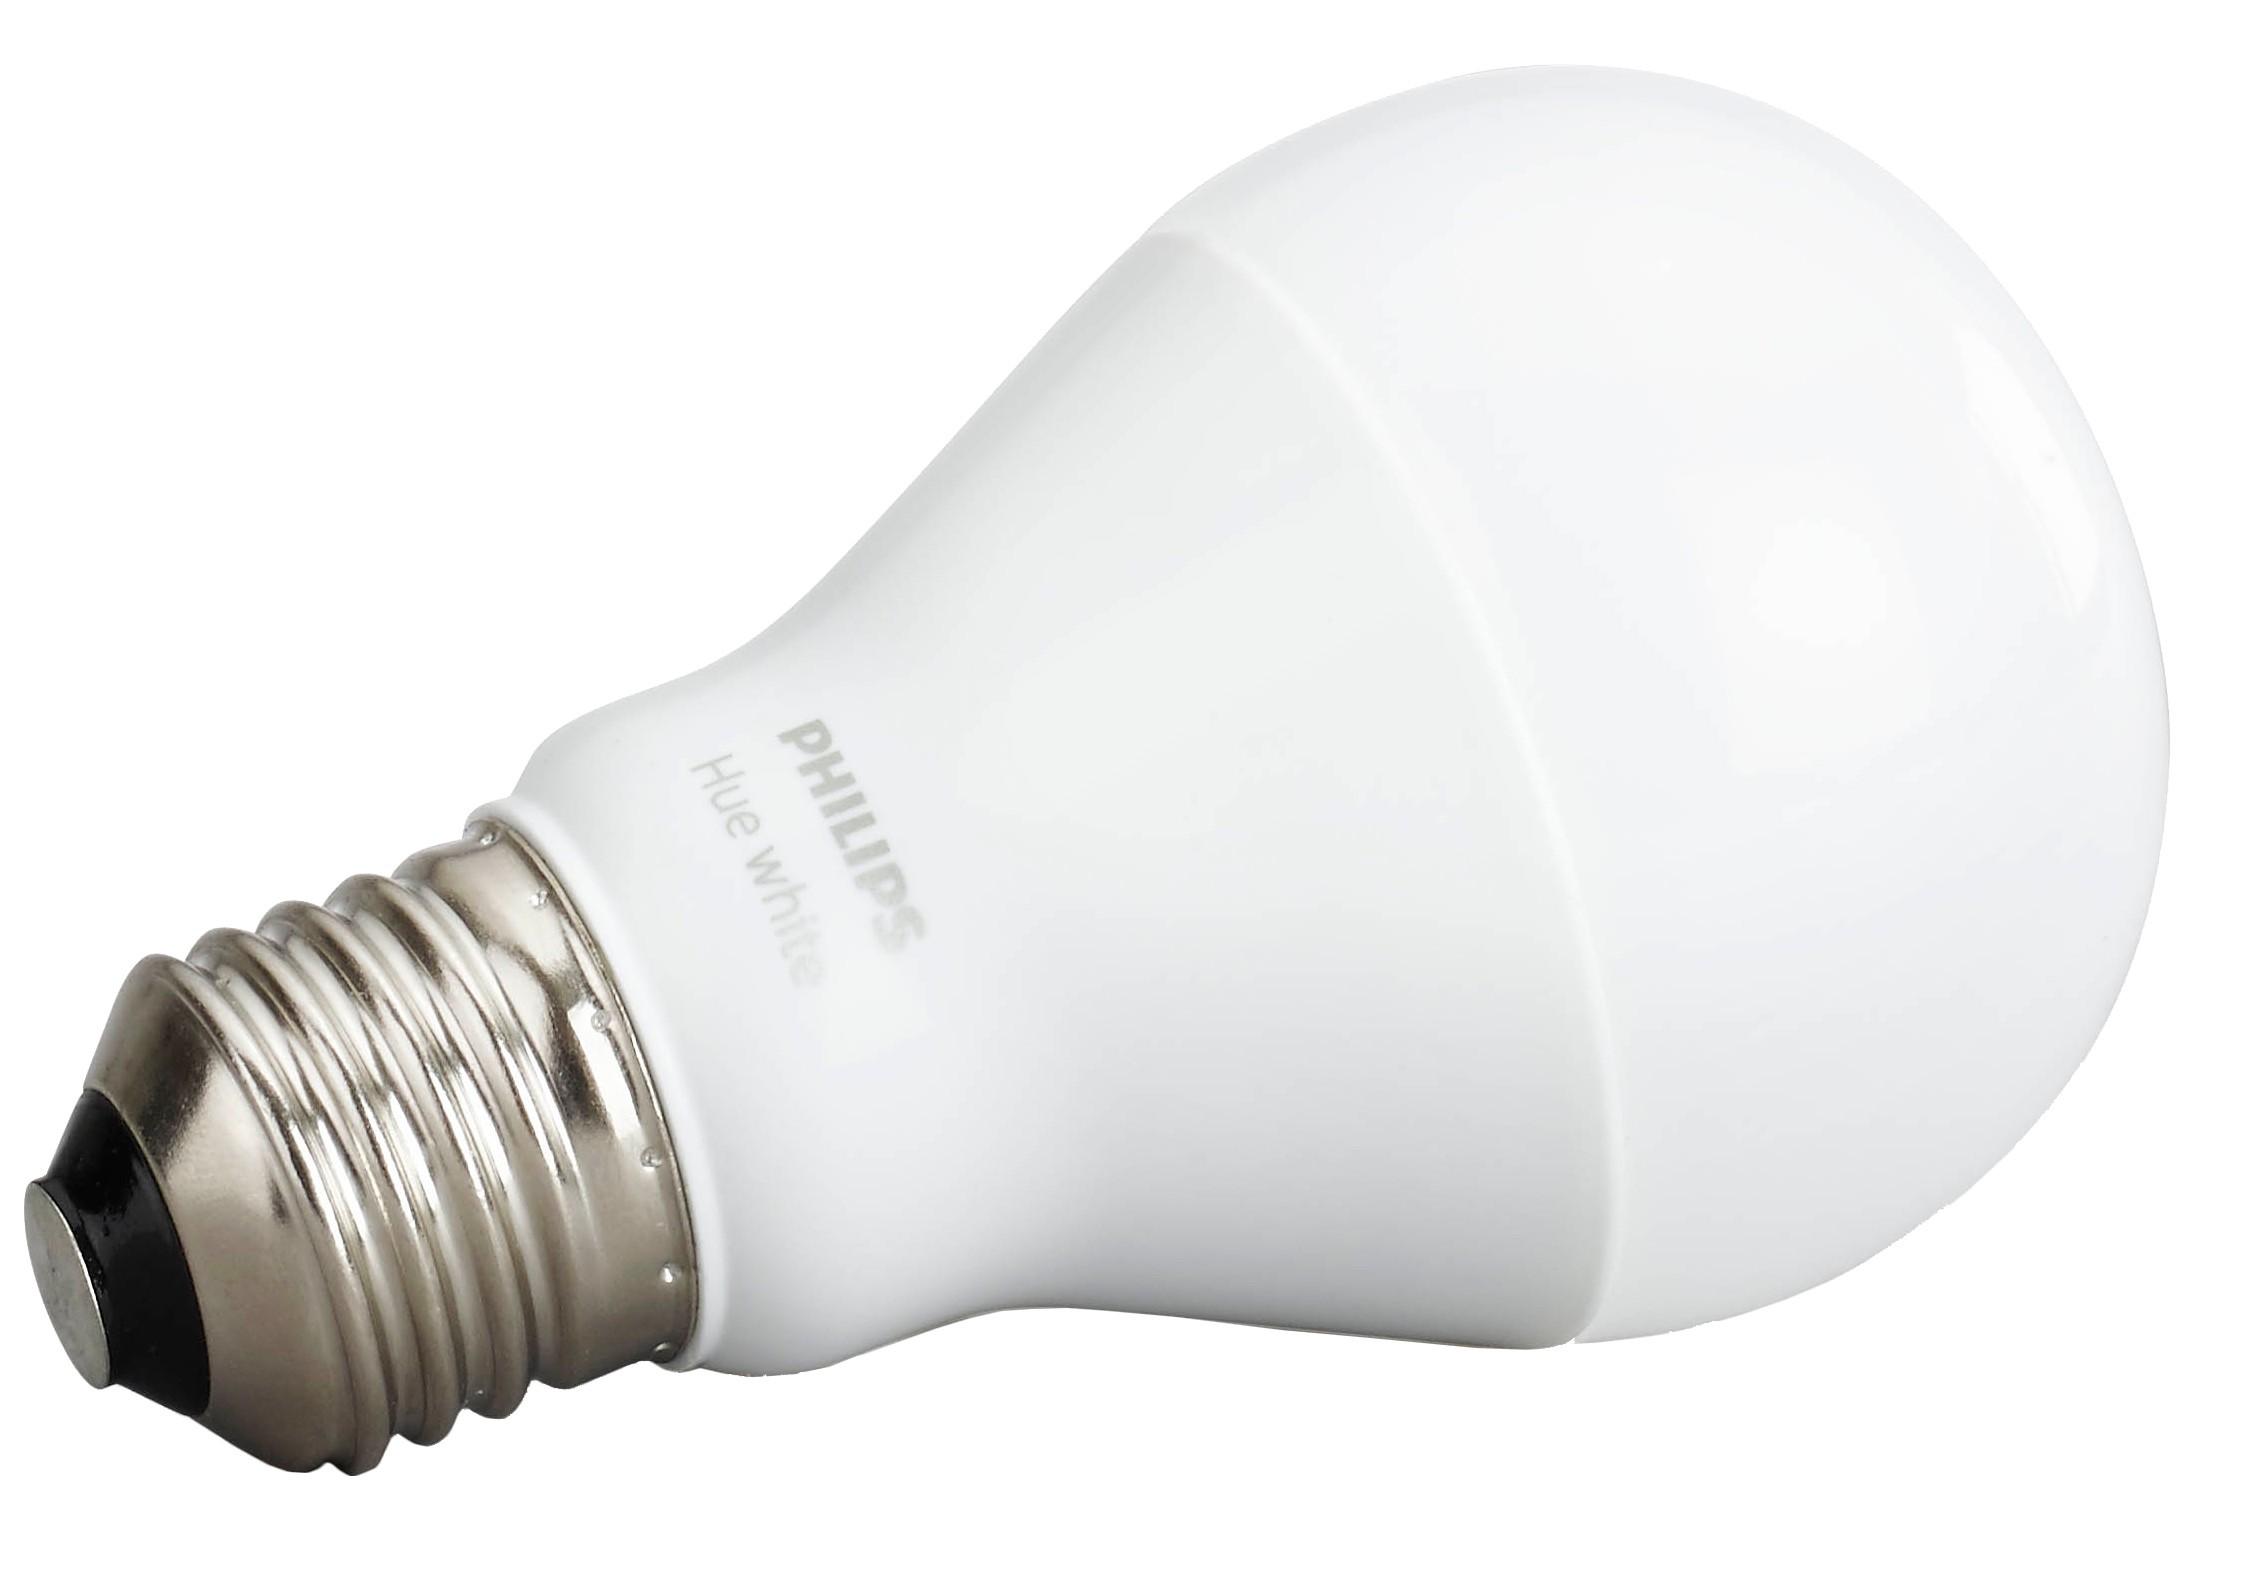 Belysning hjem og husholdning elkjøp